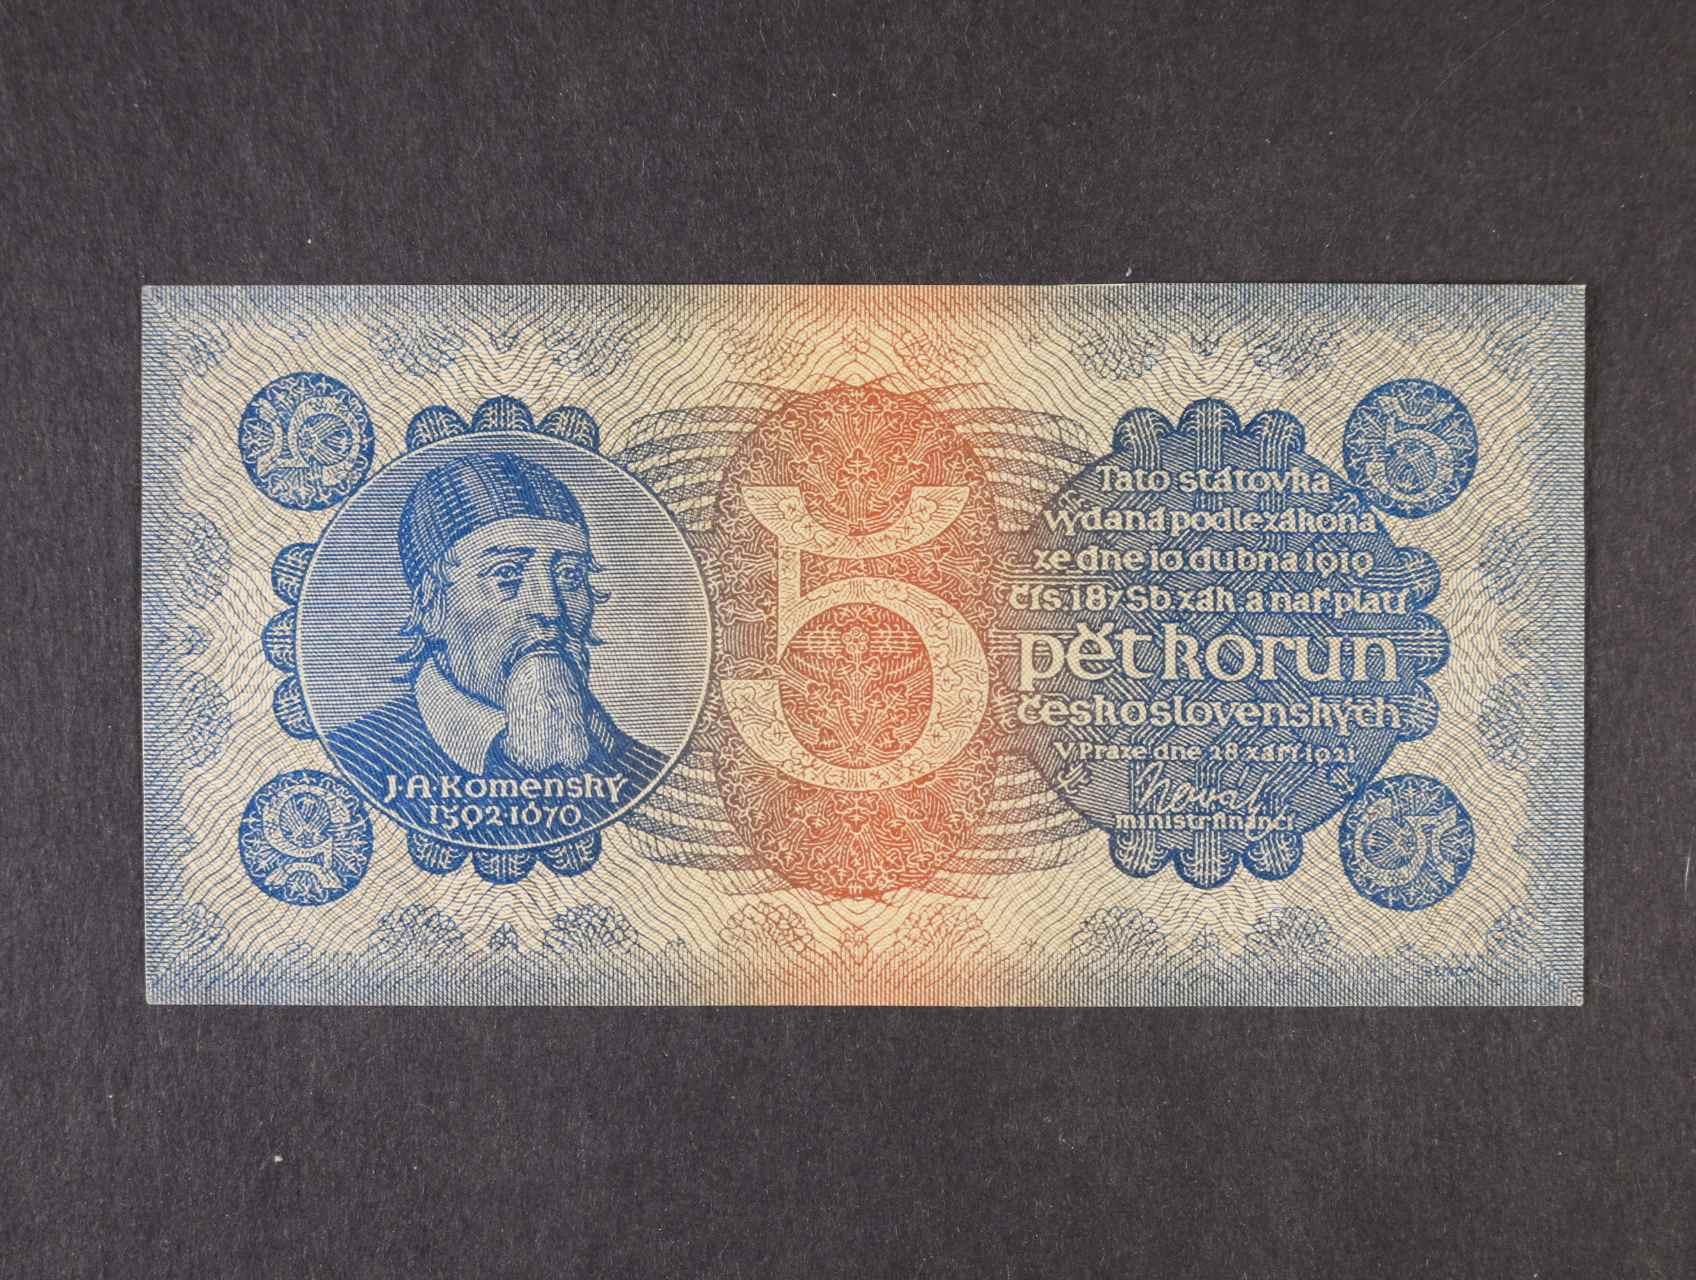 5 Kč 28.9.1921 série 2, Ba. 18,  Pi. 15